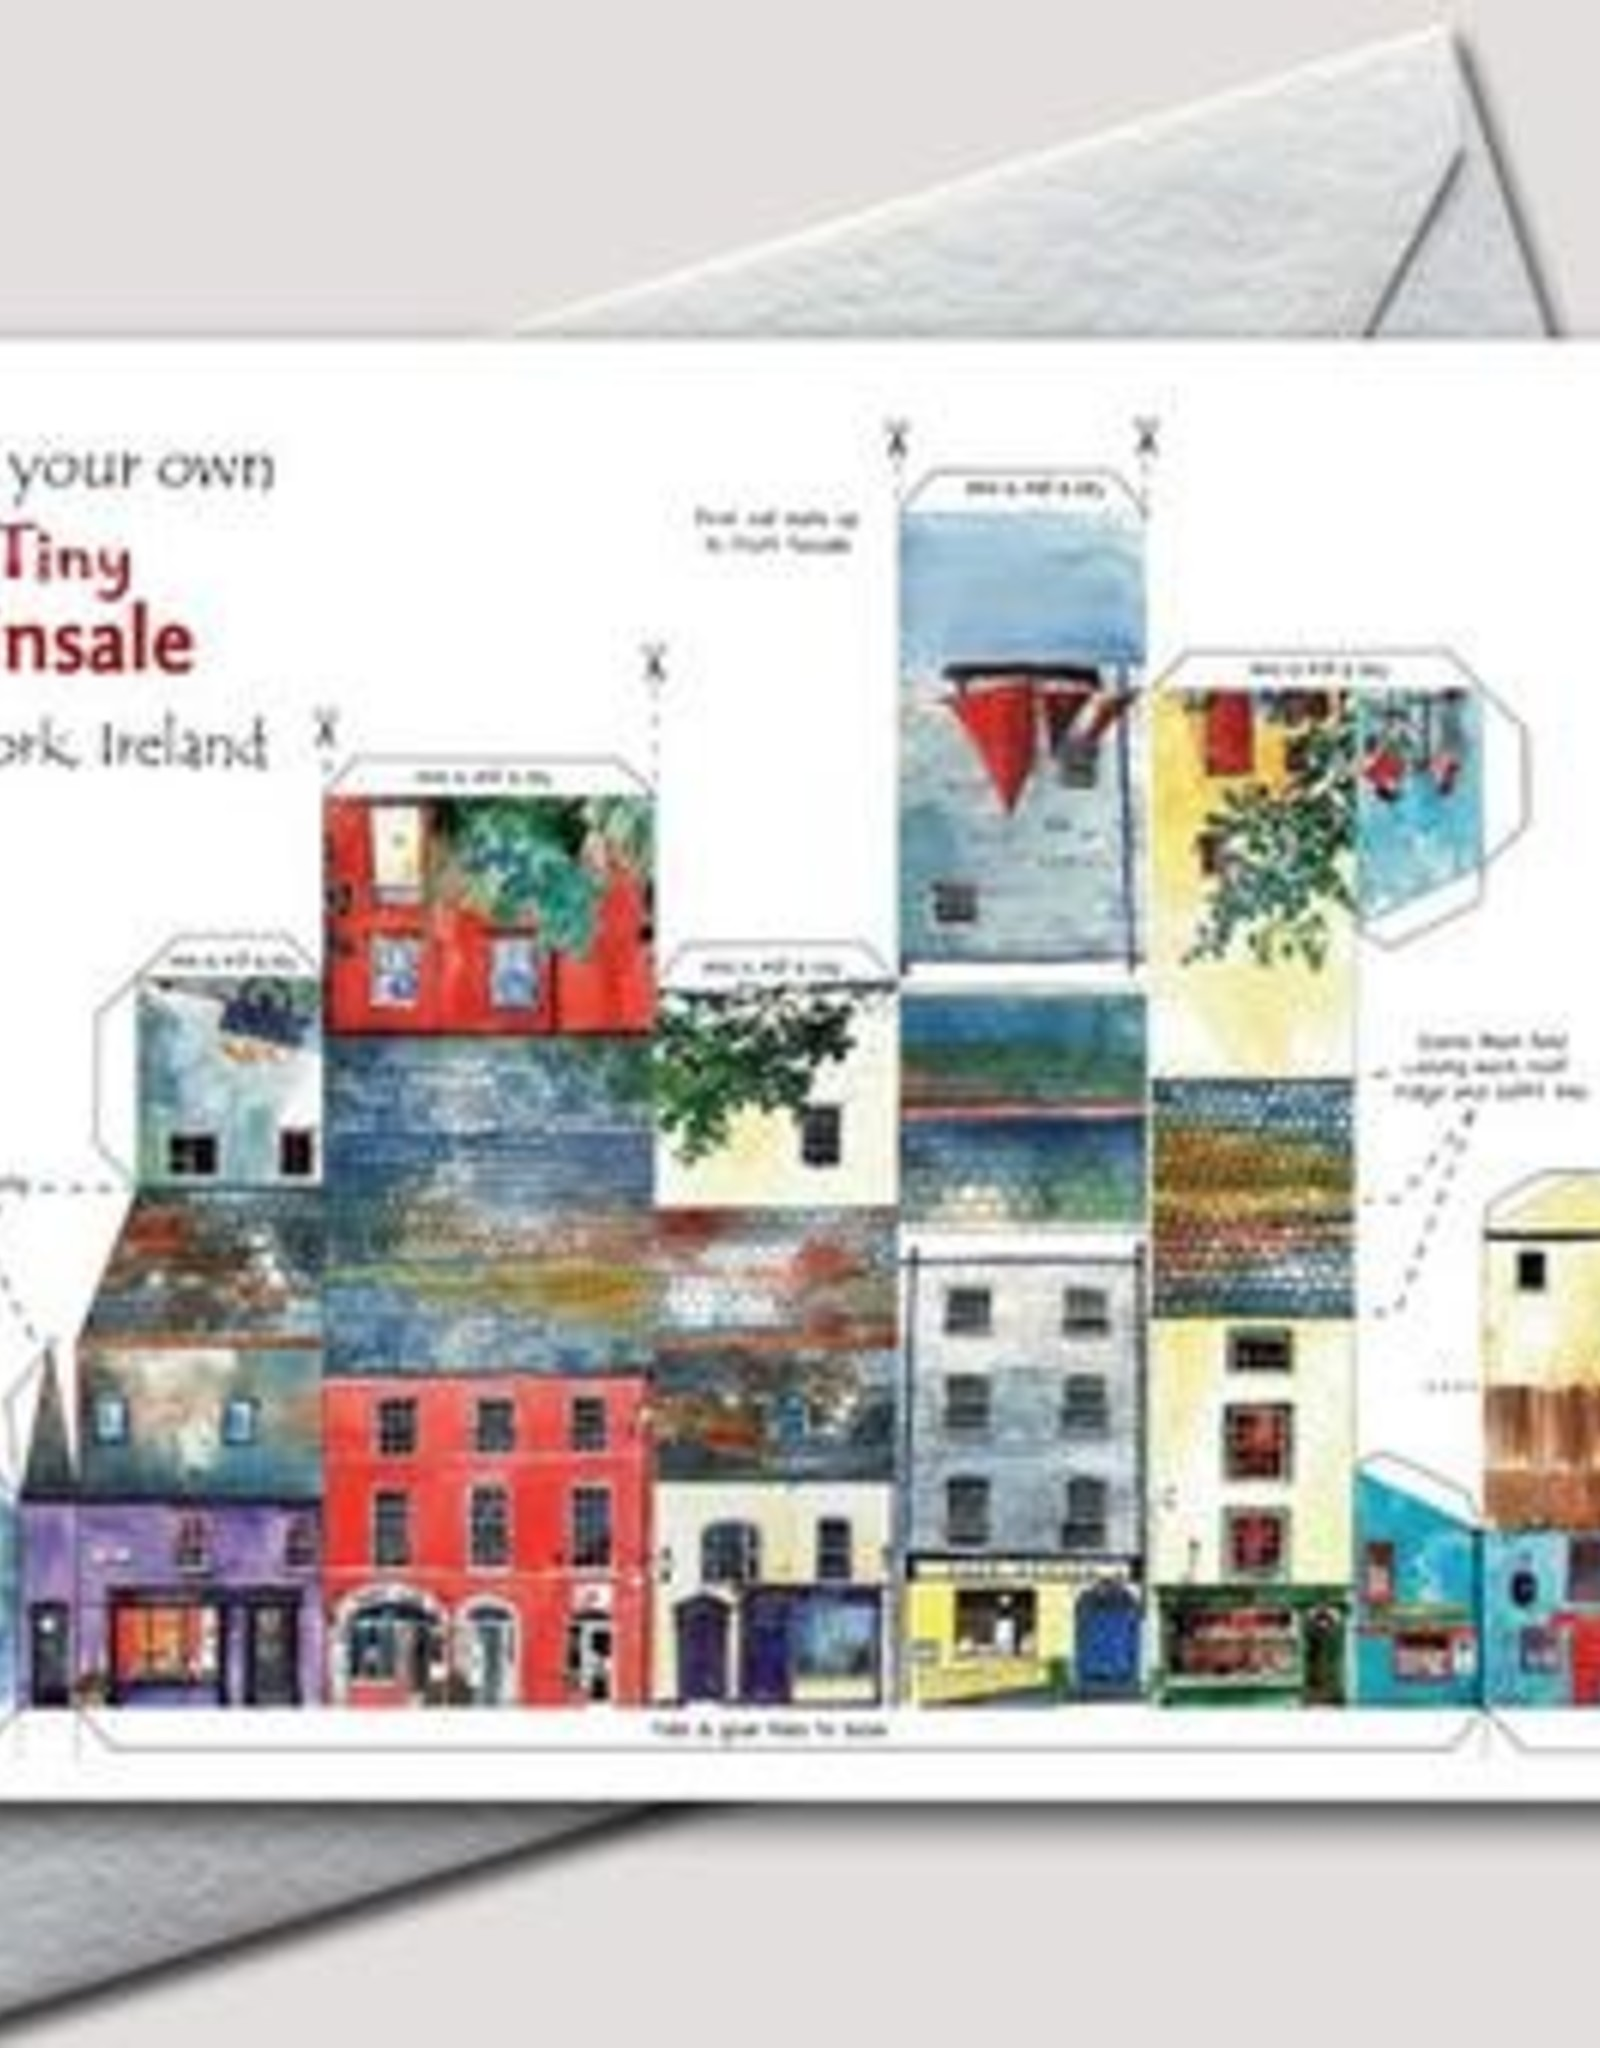 Tiny Ireland Build Your Own Tiny Kinsale A5